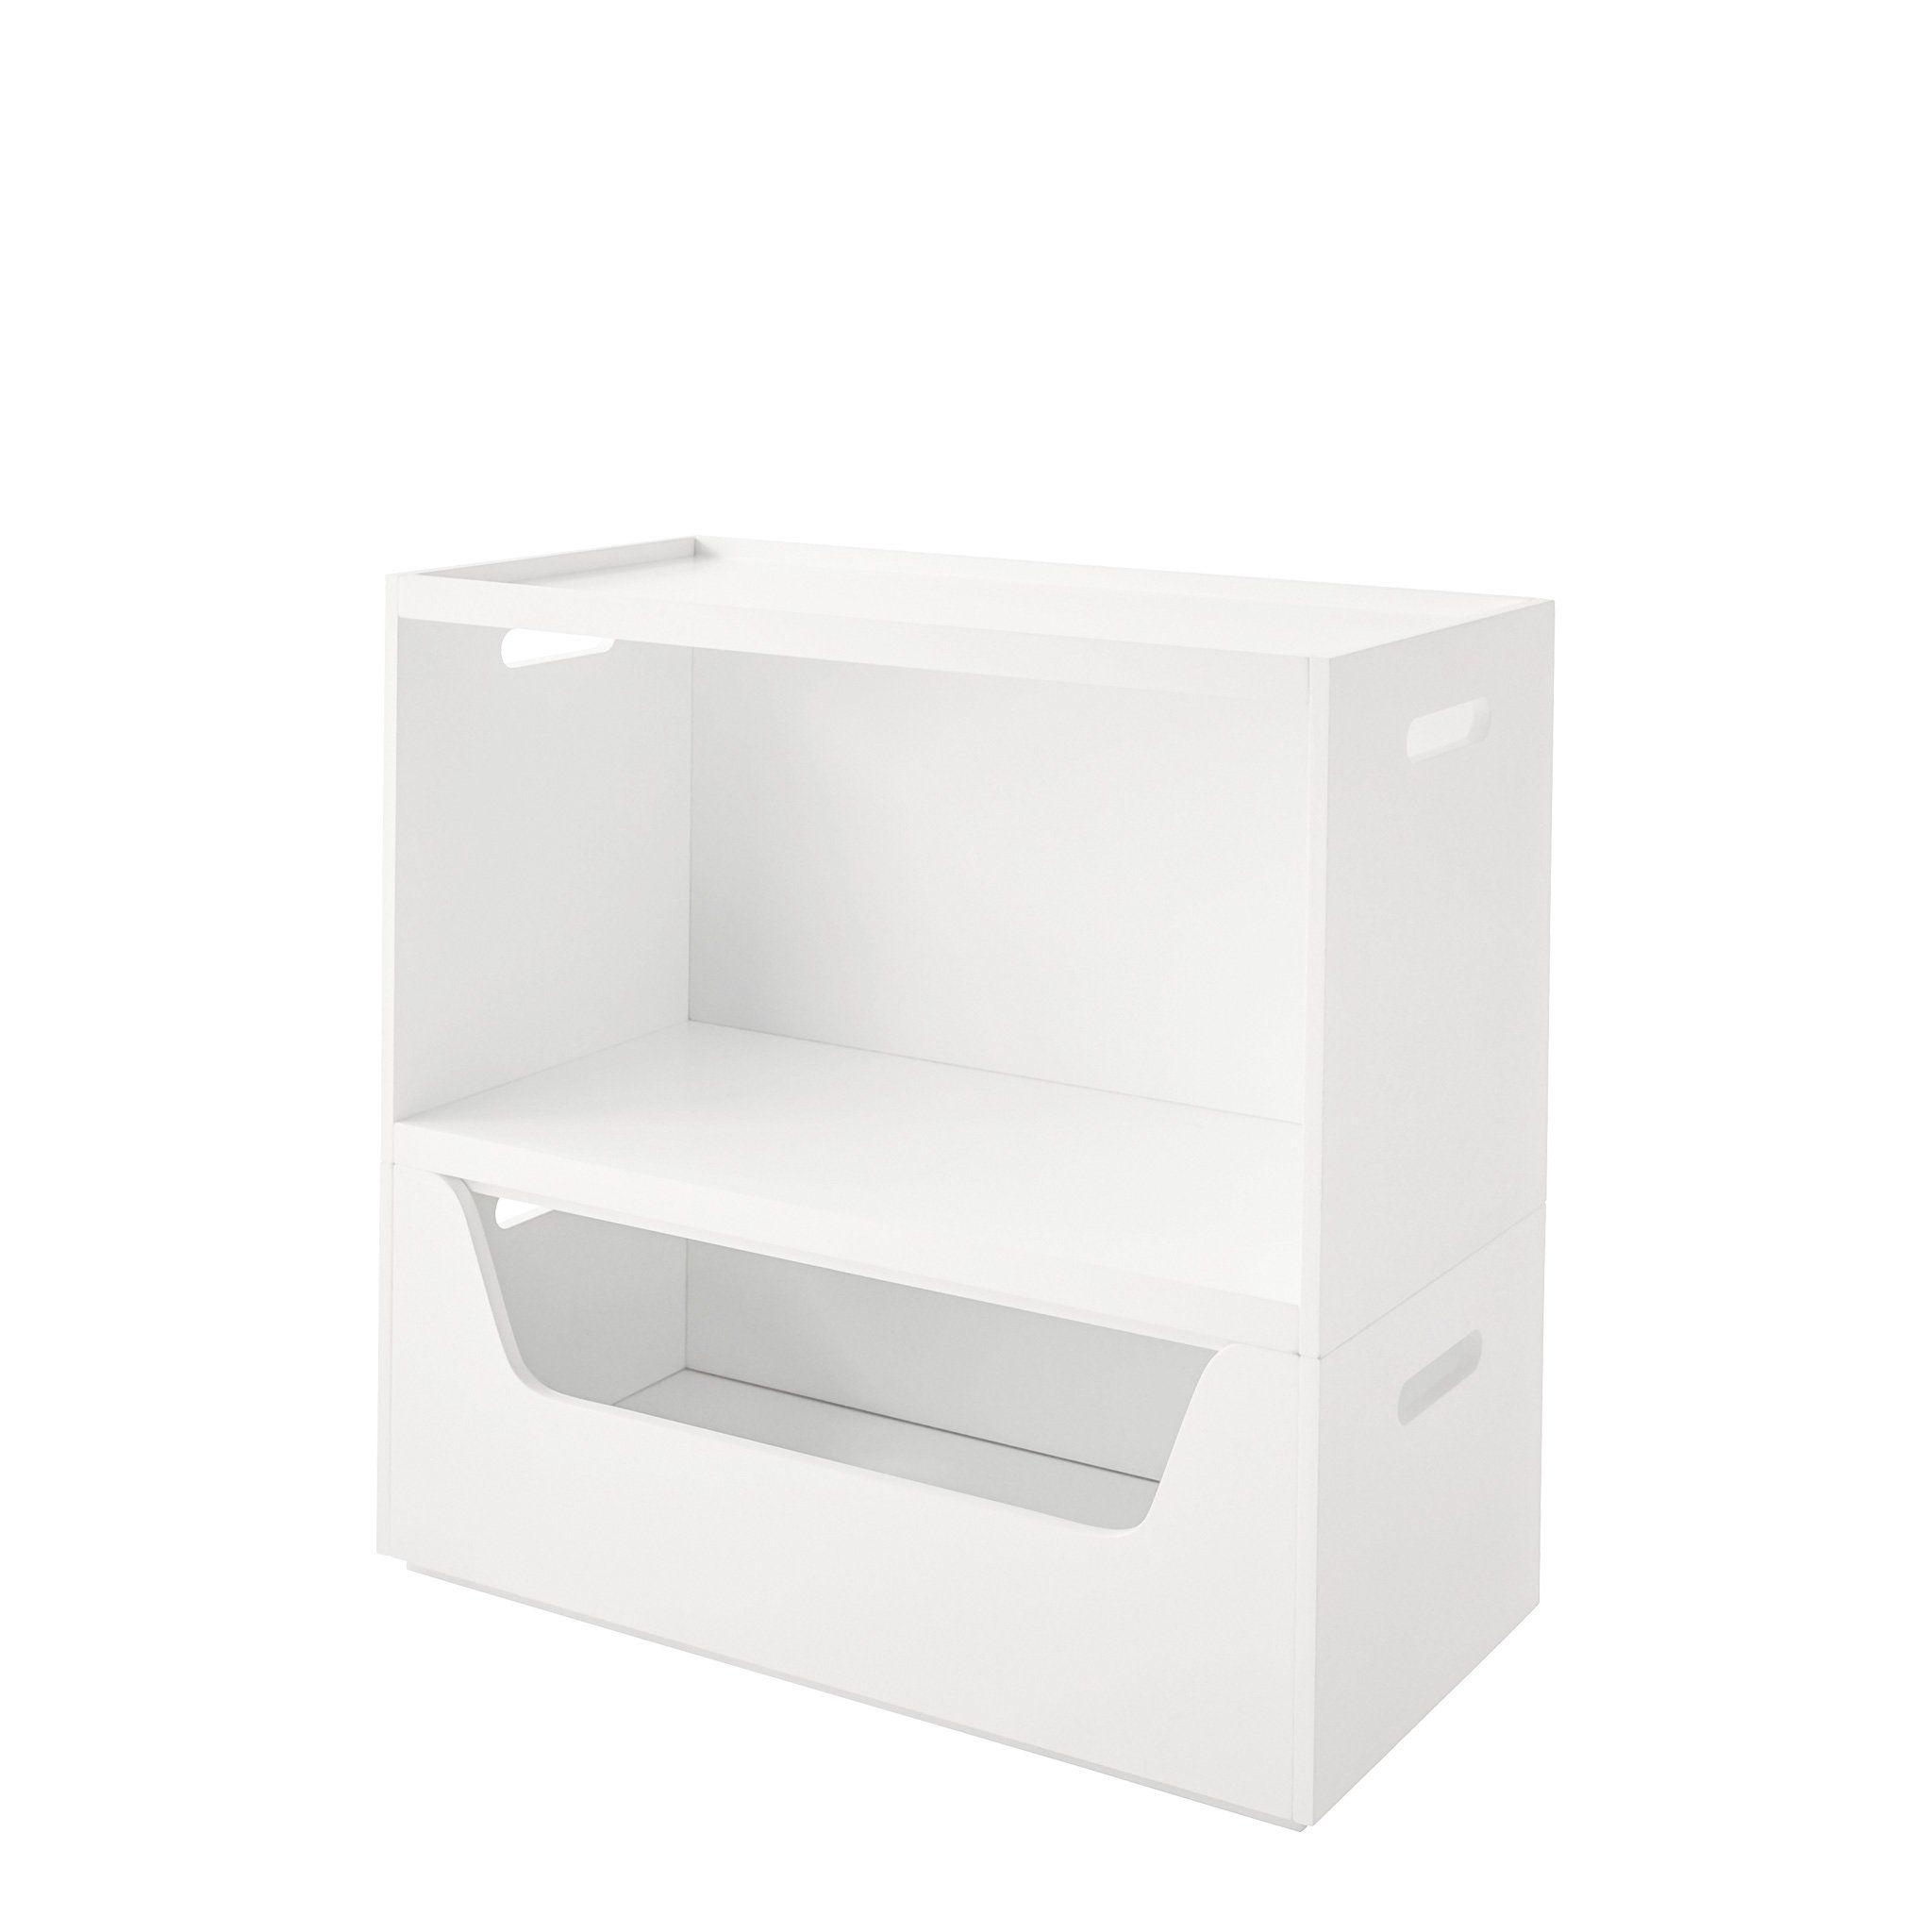 Rackham Storage Set 4 (Book Shelf & Toy Box) from Great